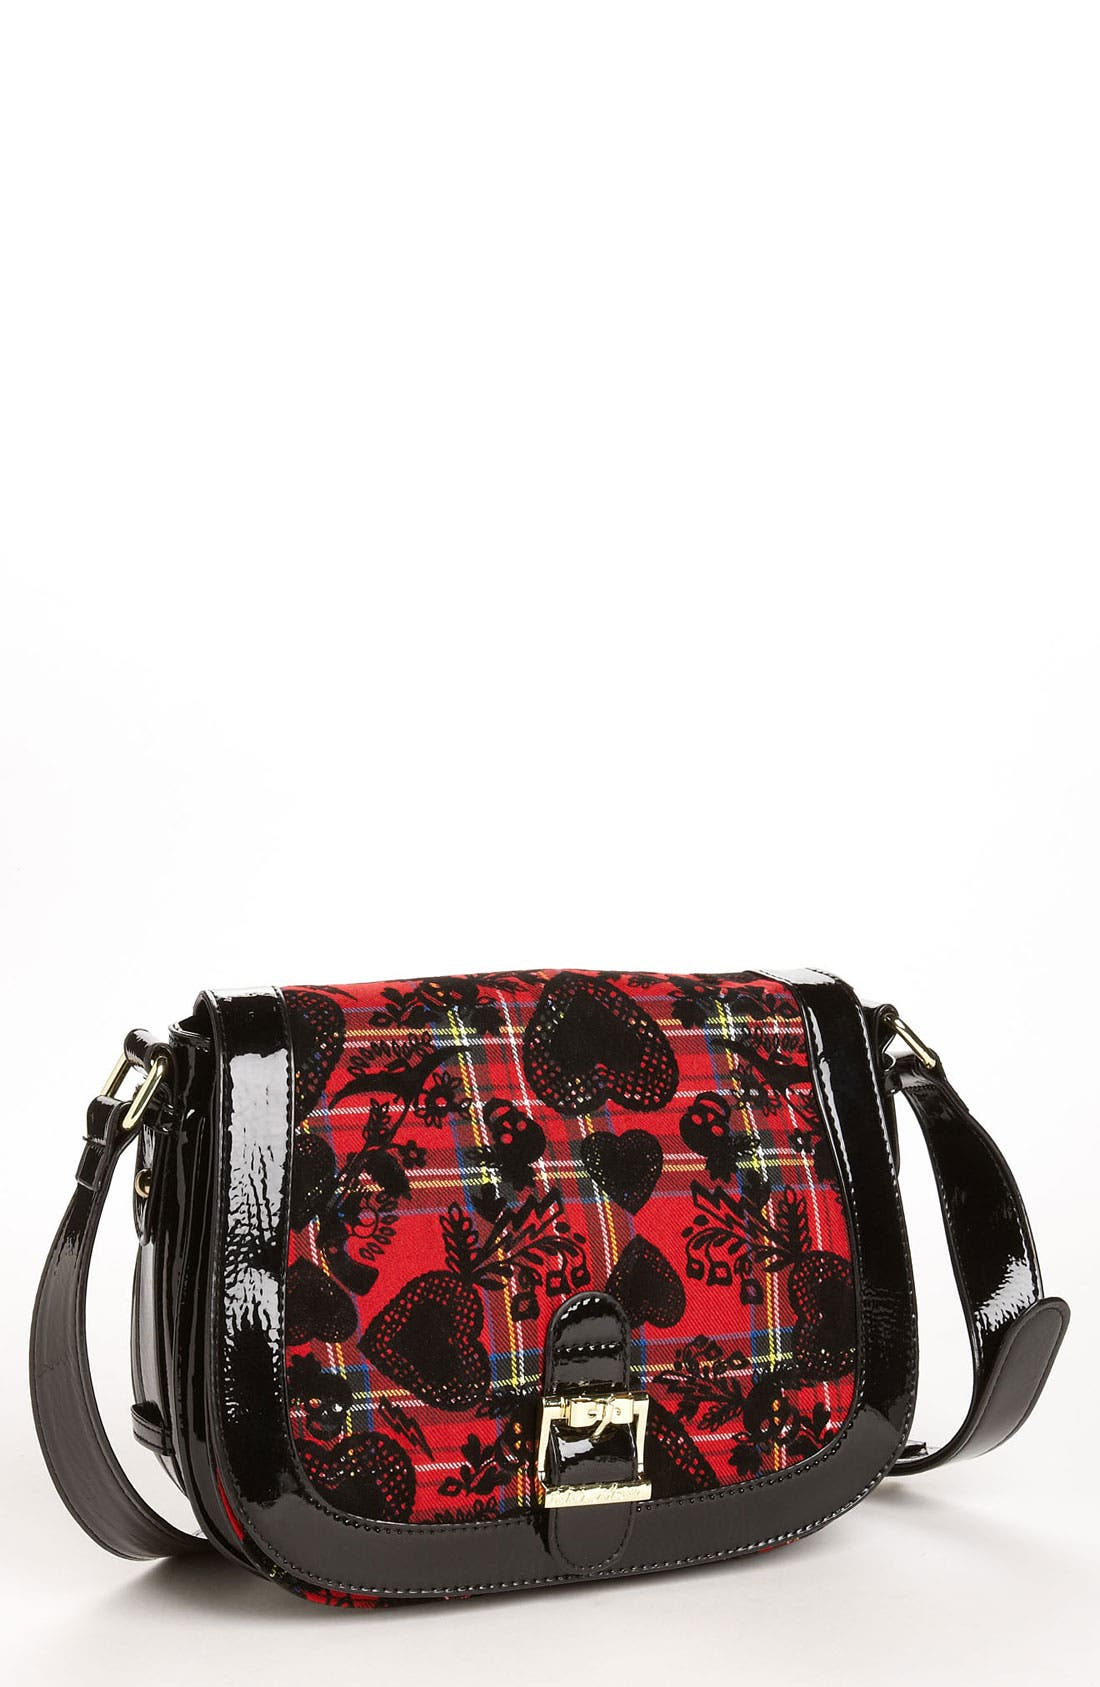 Alternate Image 1 Selected - Betsey Johnson 'School of Hearts' Crossbody Bag